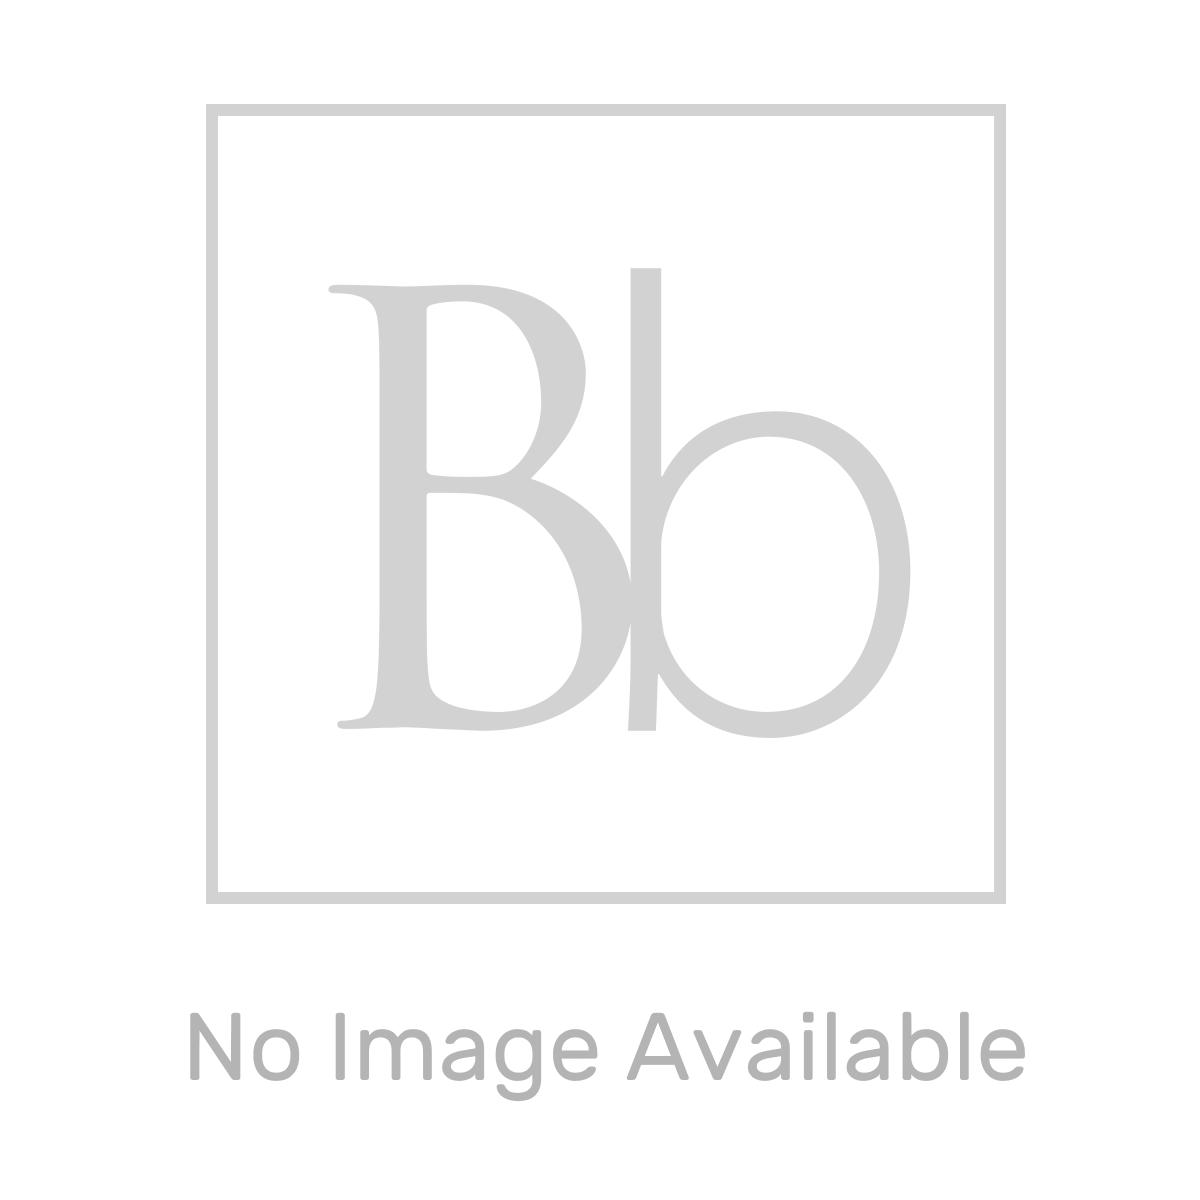 Nuie Athena Hacienda Black 2 Drawer Wall Hung Vanity Unit with 18mm Worktop 600mm Line Drawing